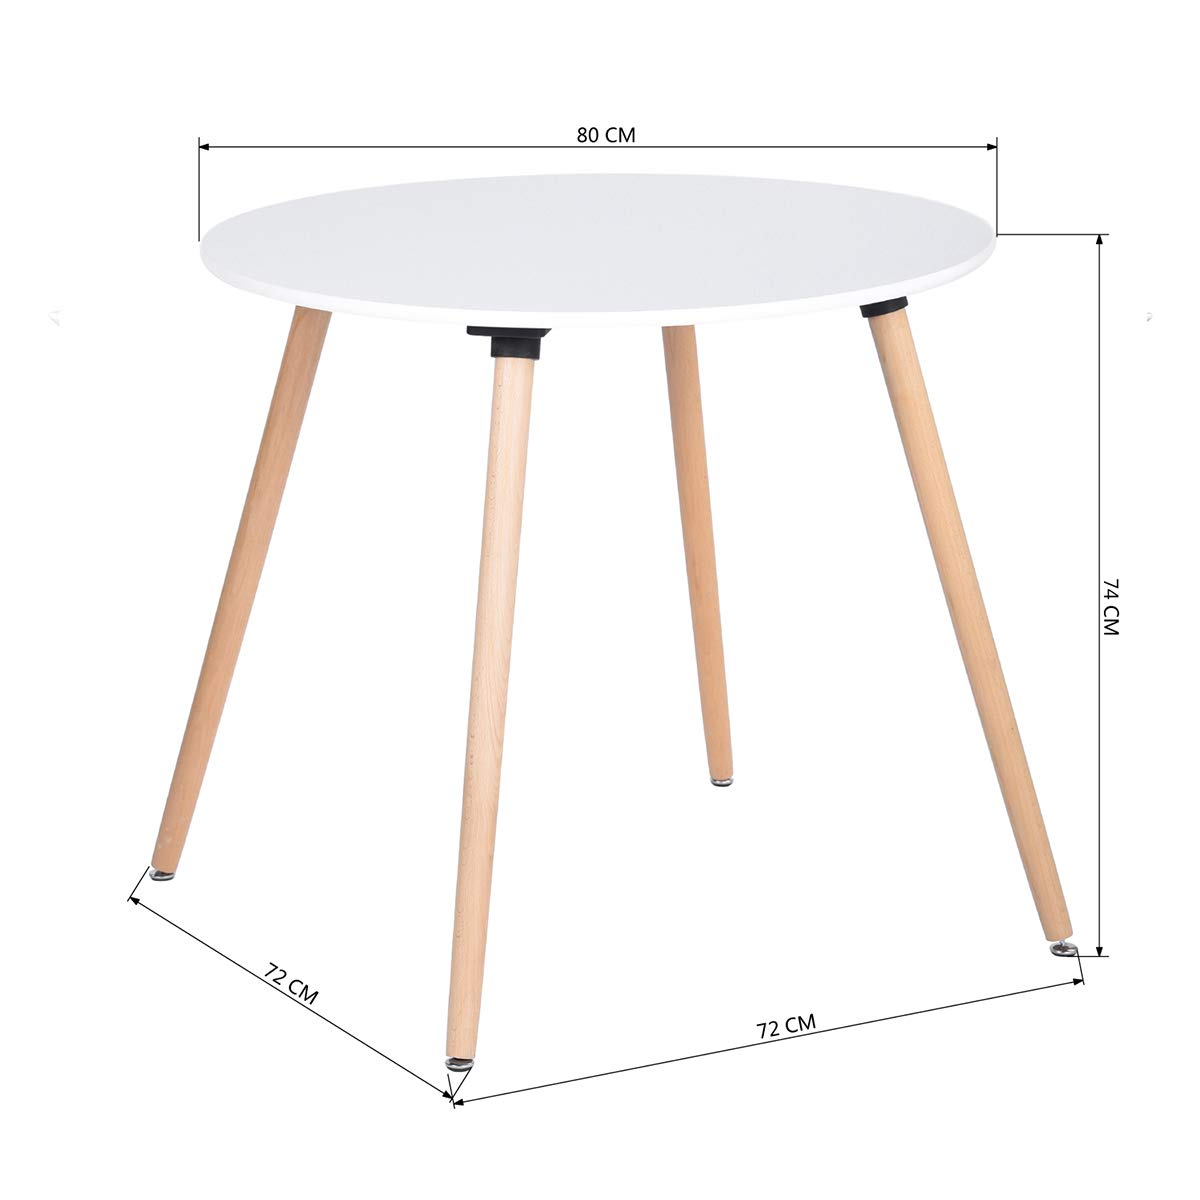 unici Mobili Cosy Tavolini da sala da pranzo